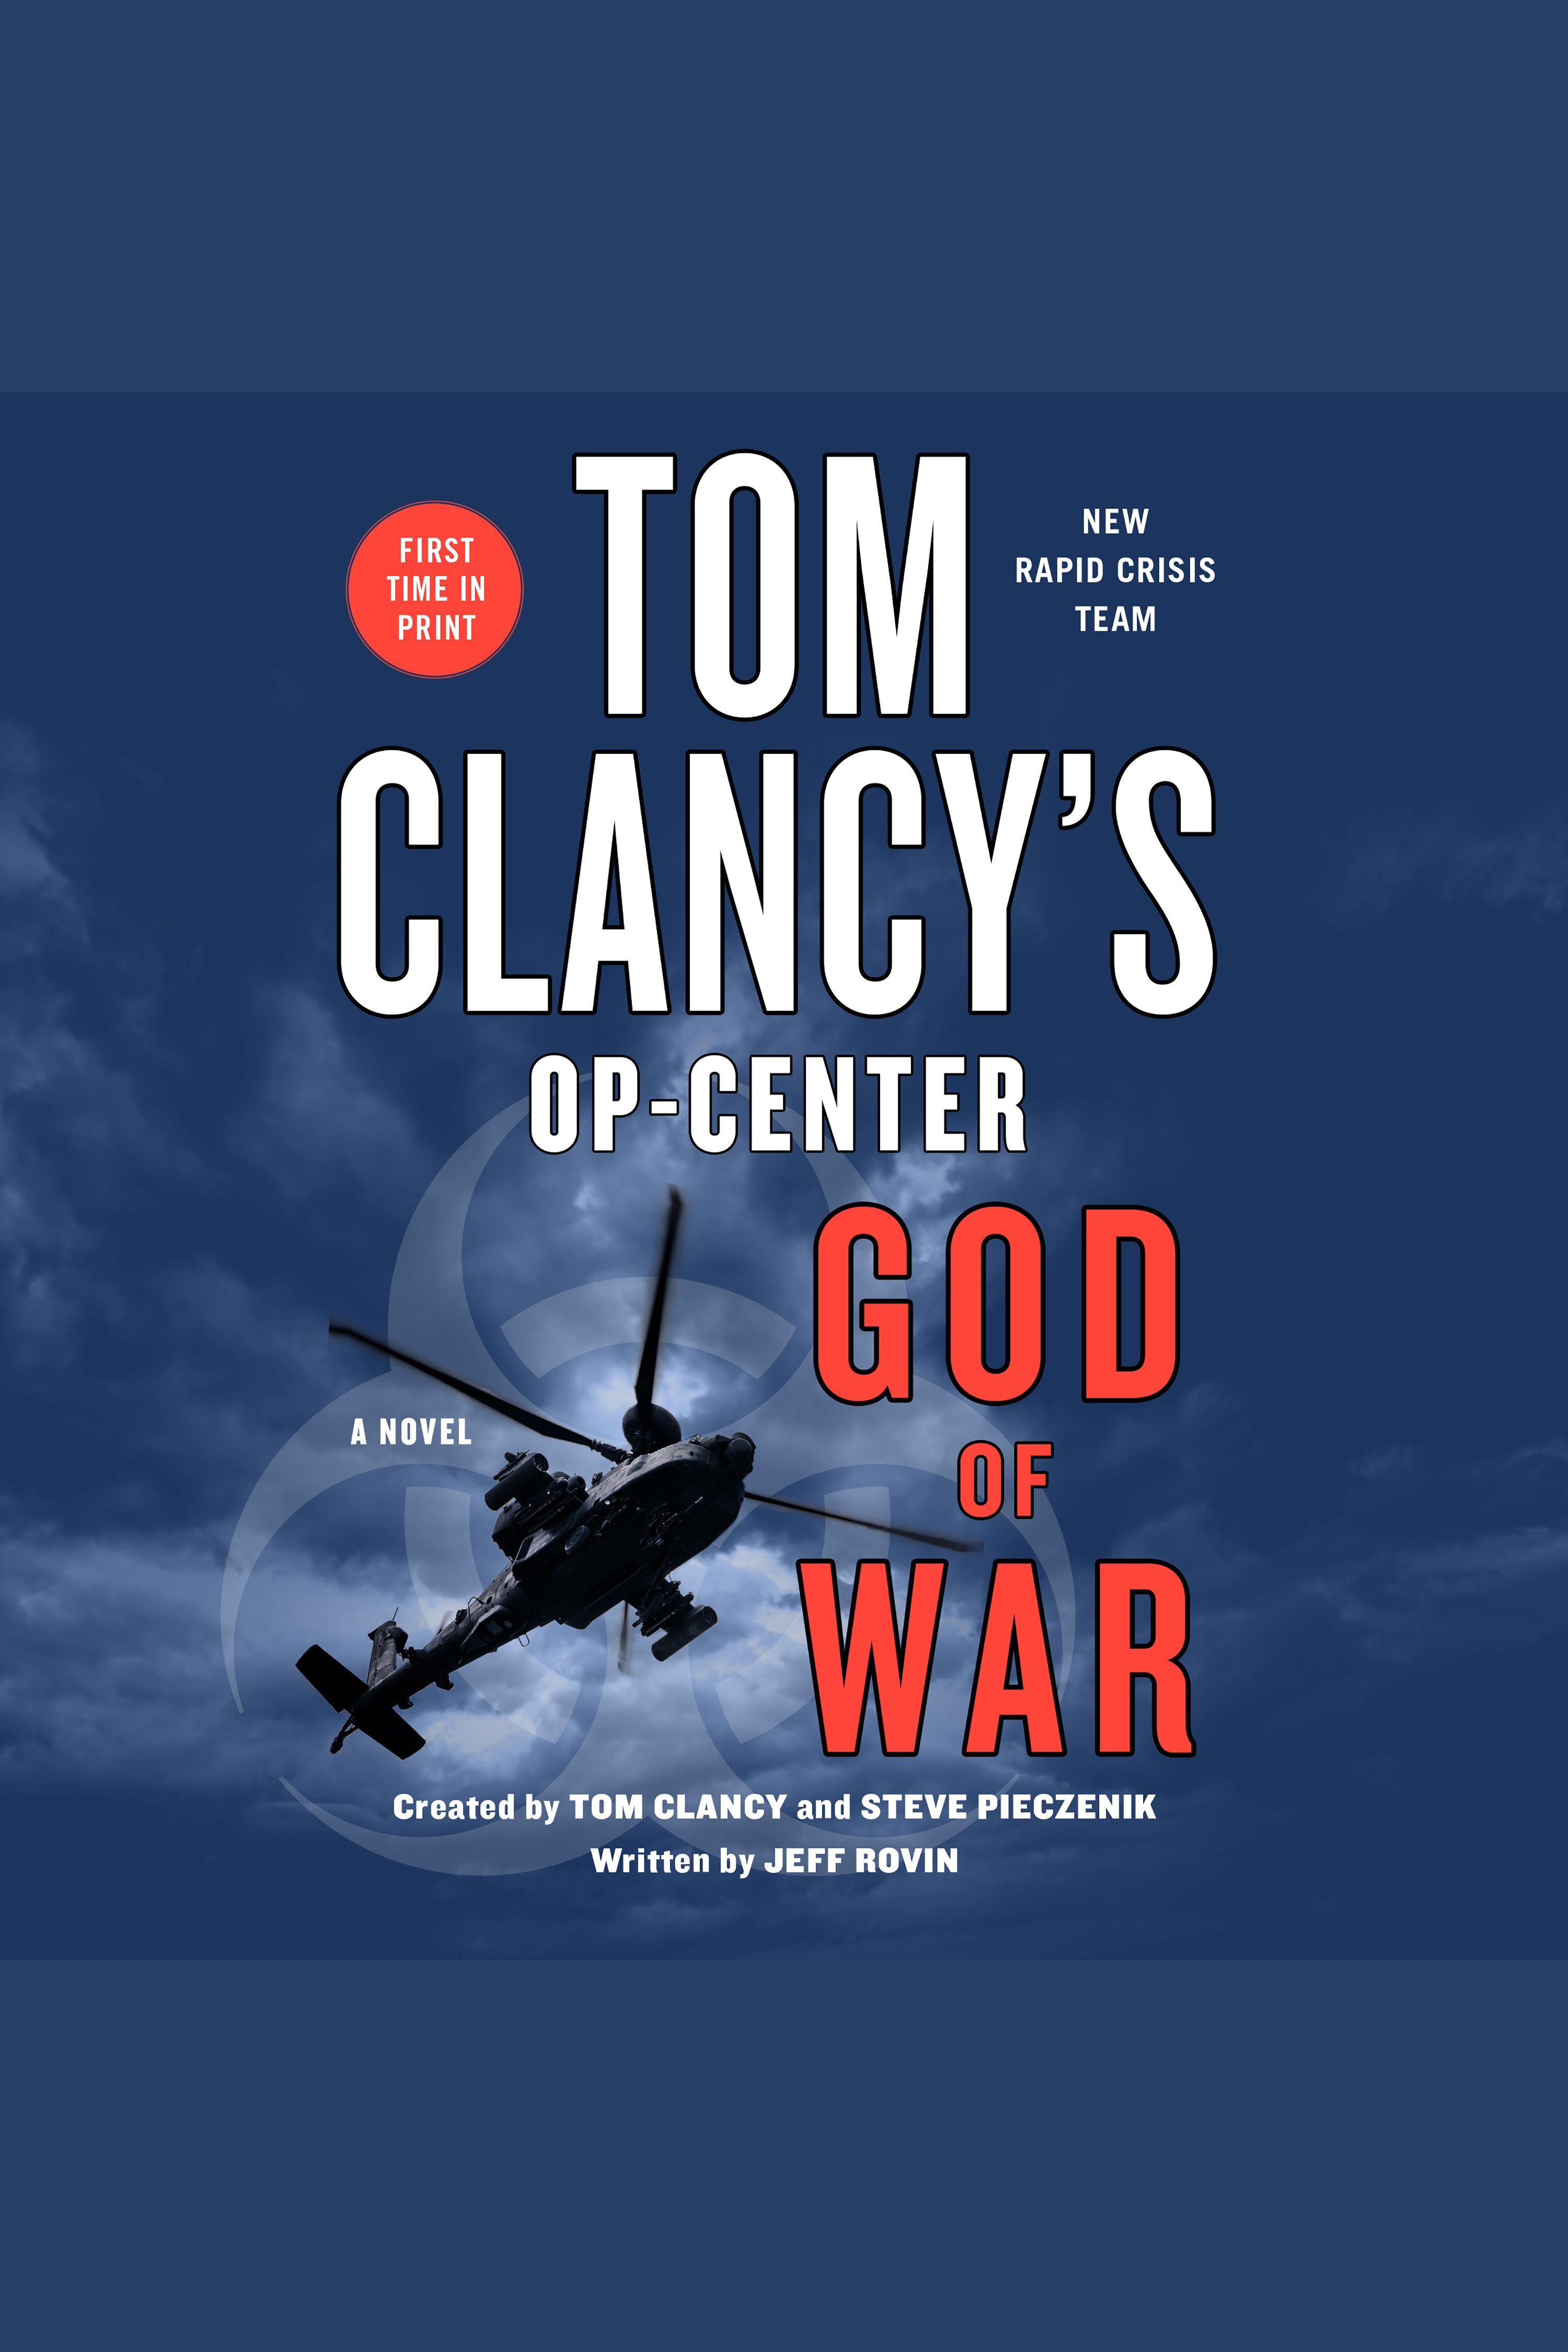 Tom Clancy's Op-Center: God of War A Novel